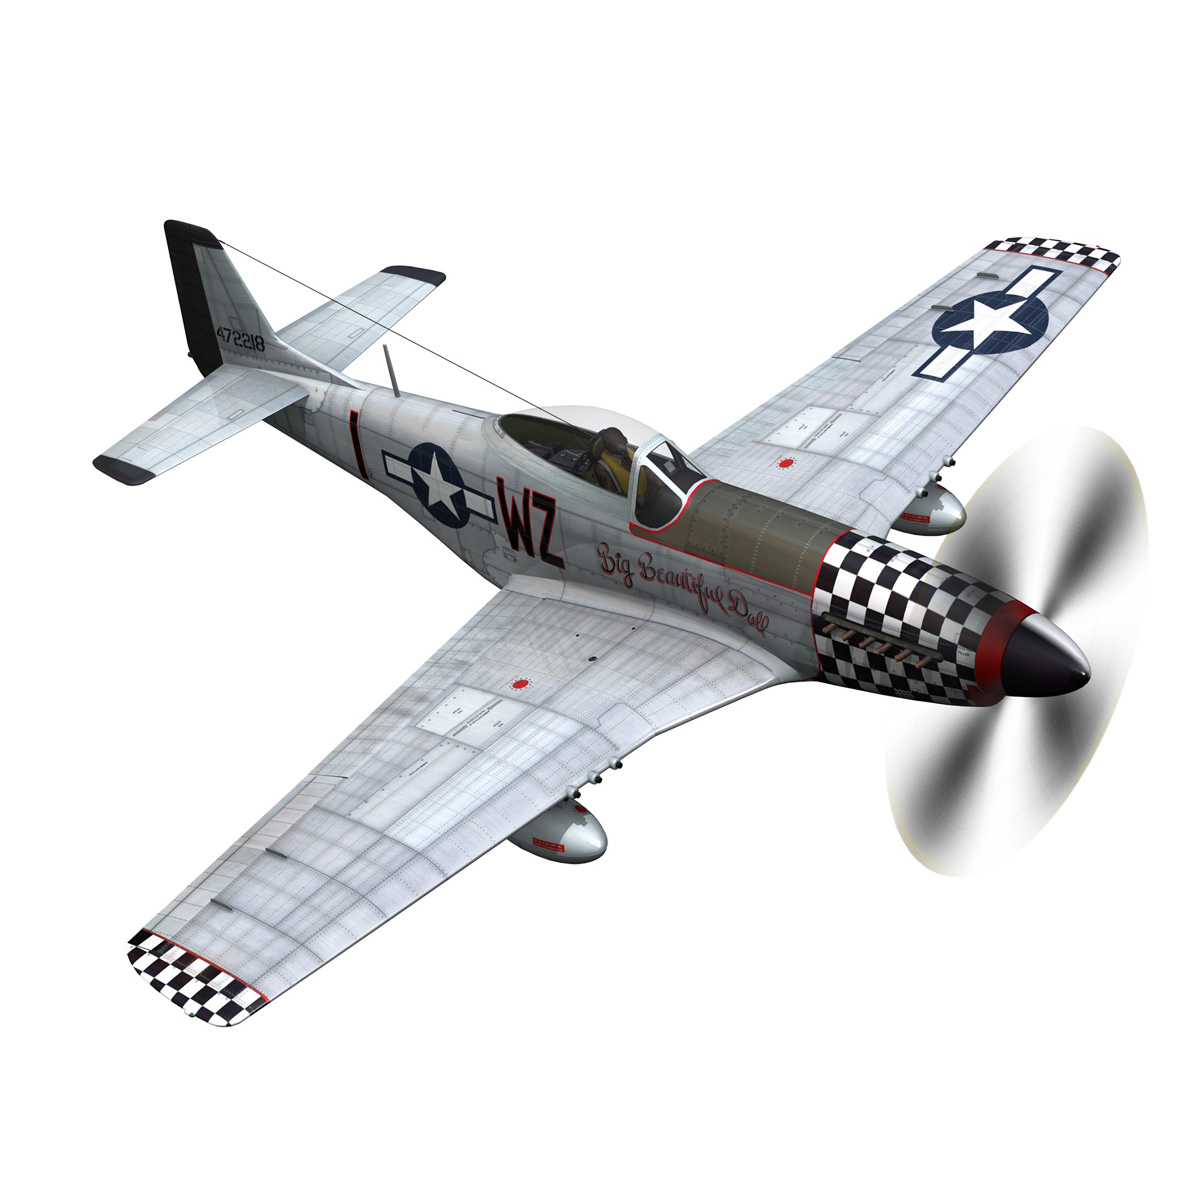 north american p-51d mustang – big beautiful doll 3d model fbx c4d lwo obj 282558